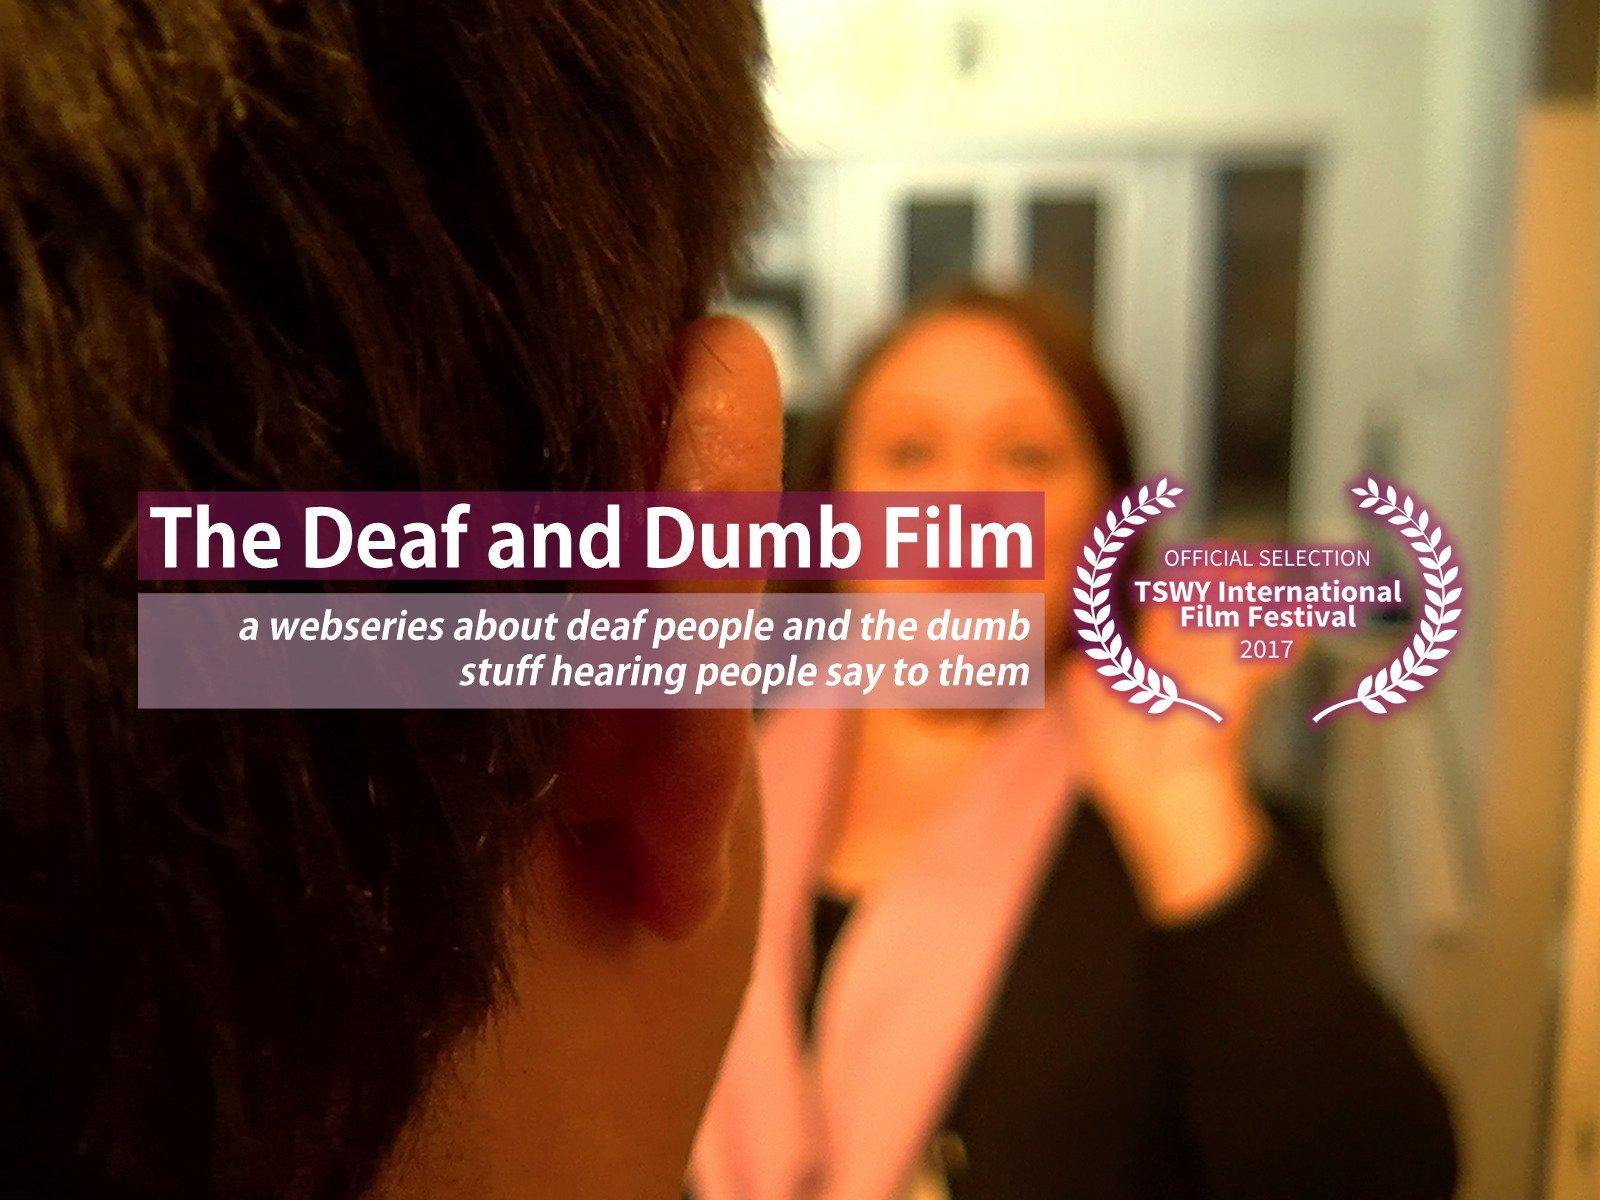 The Deaf and Dumb Film - Season 1